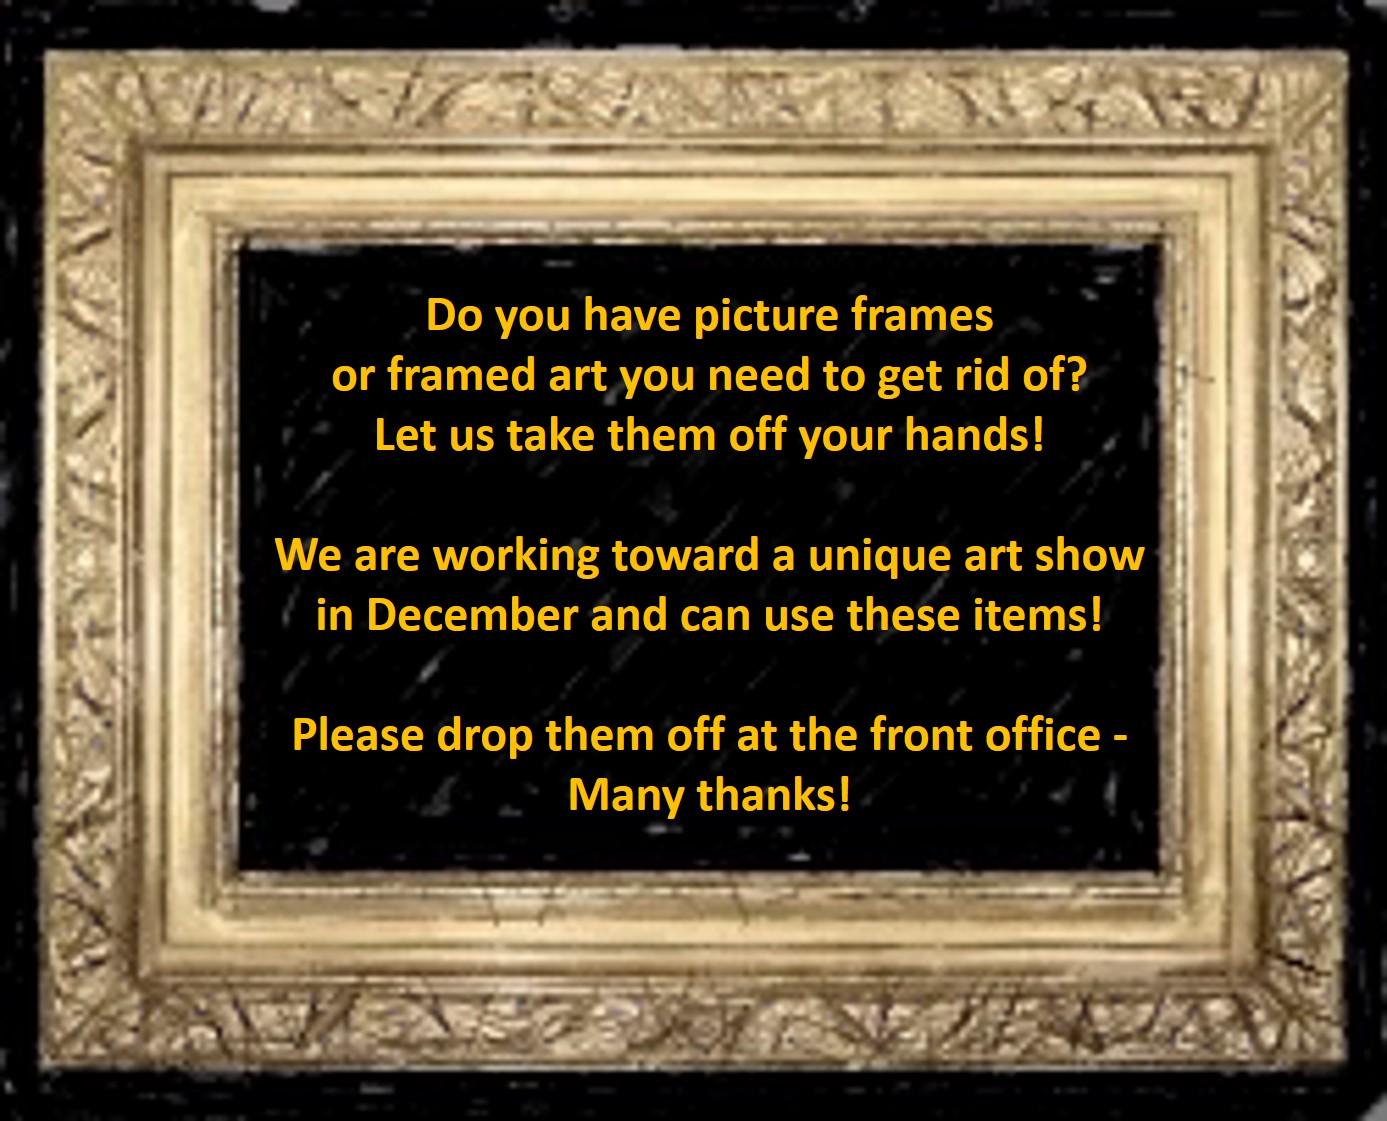 ms-hs-frame-donations.jpg